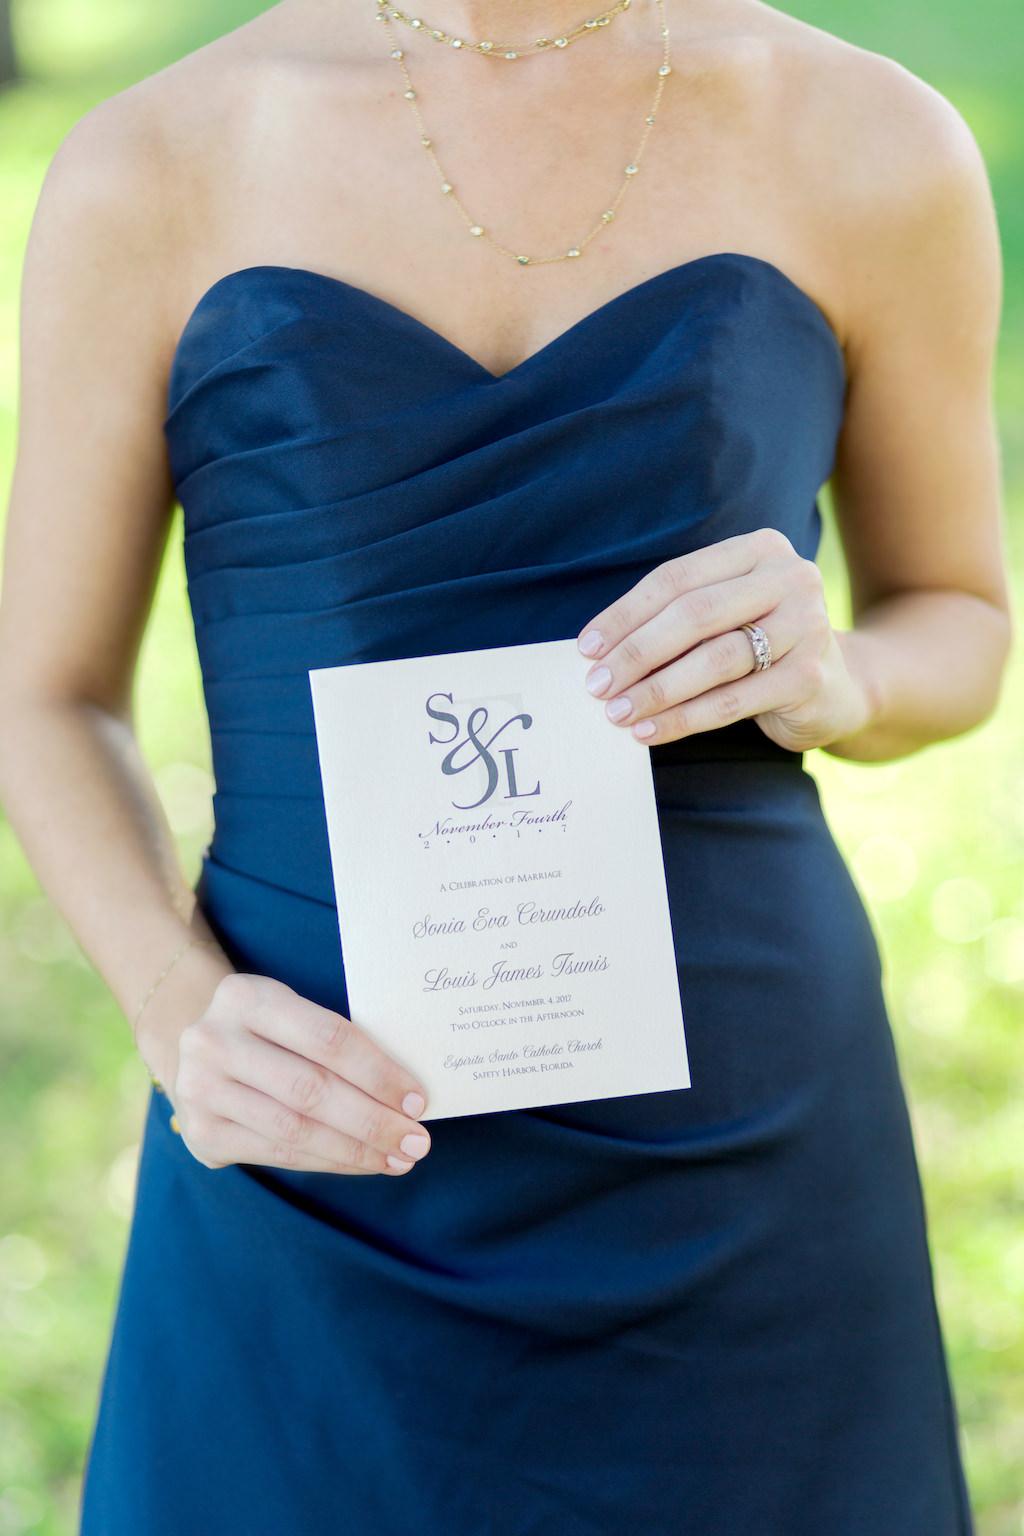 Navy Blue Bridesmaid Dress and White and Blue Wedding Program